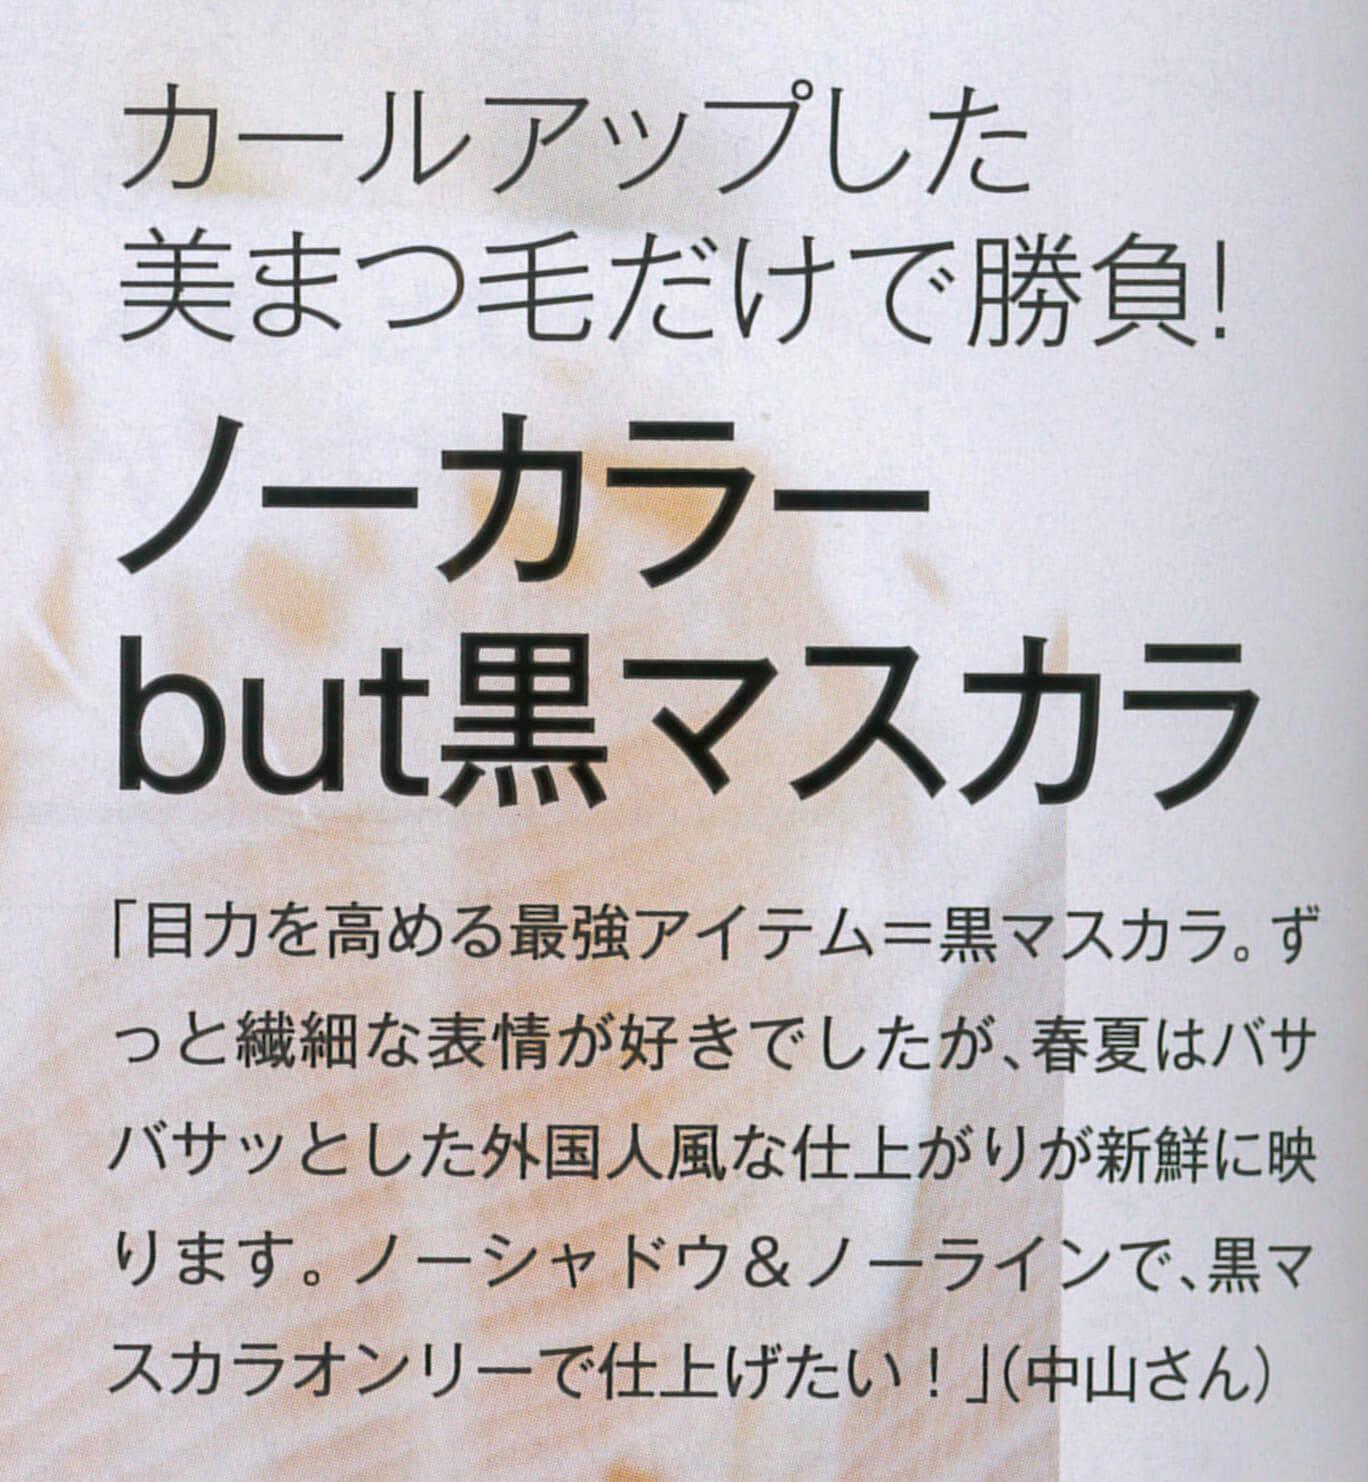 sweet 5月号(2016年5月12日発行)